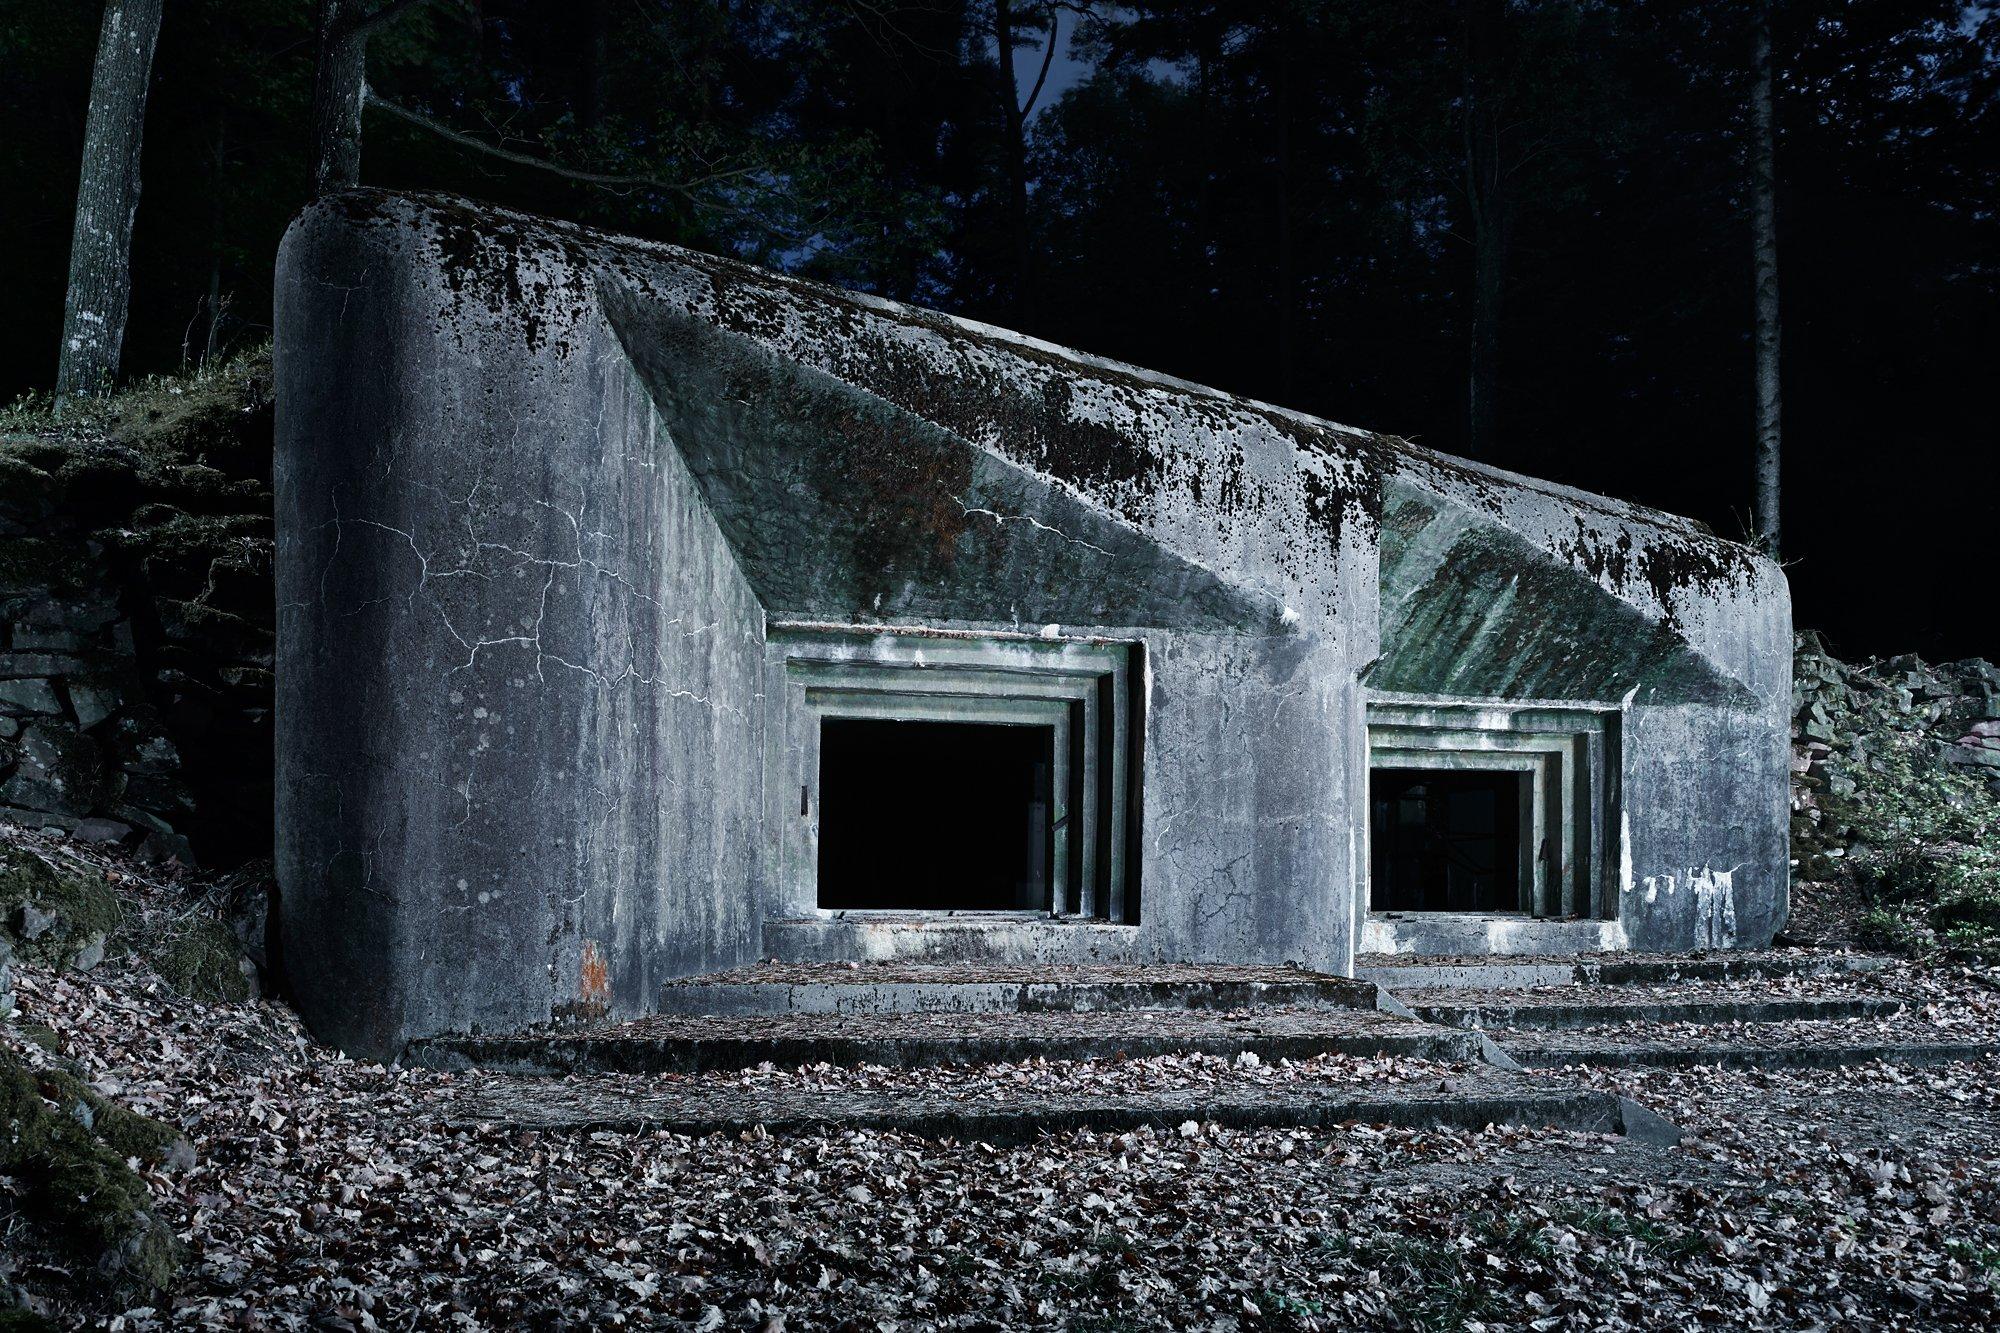 Casemate d'artillerie de Windstein